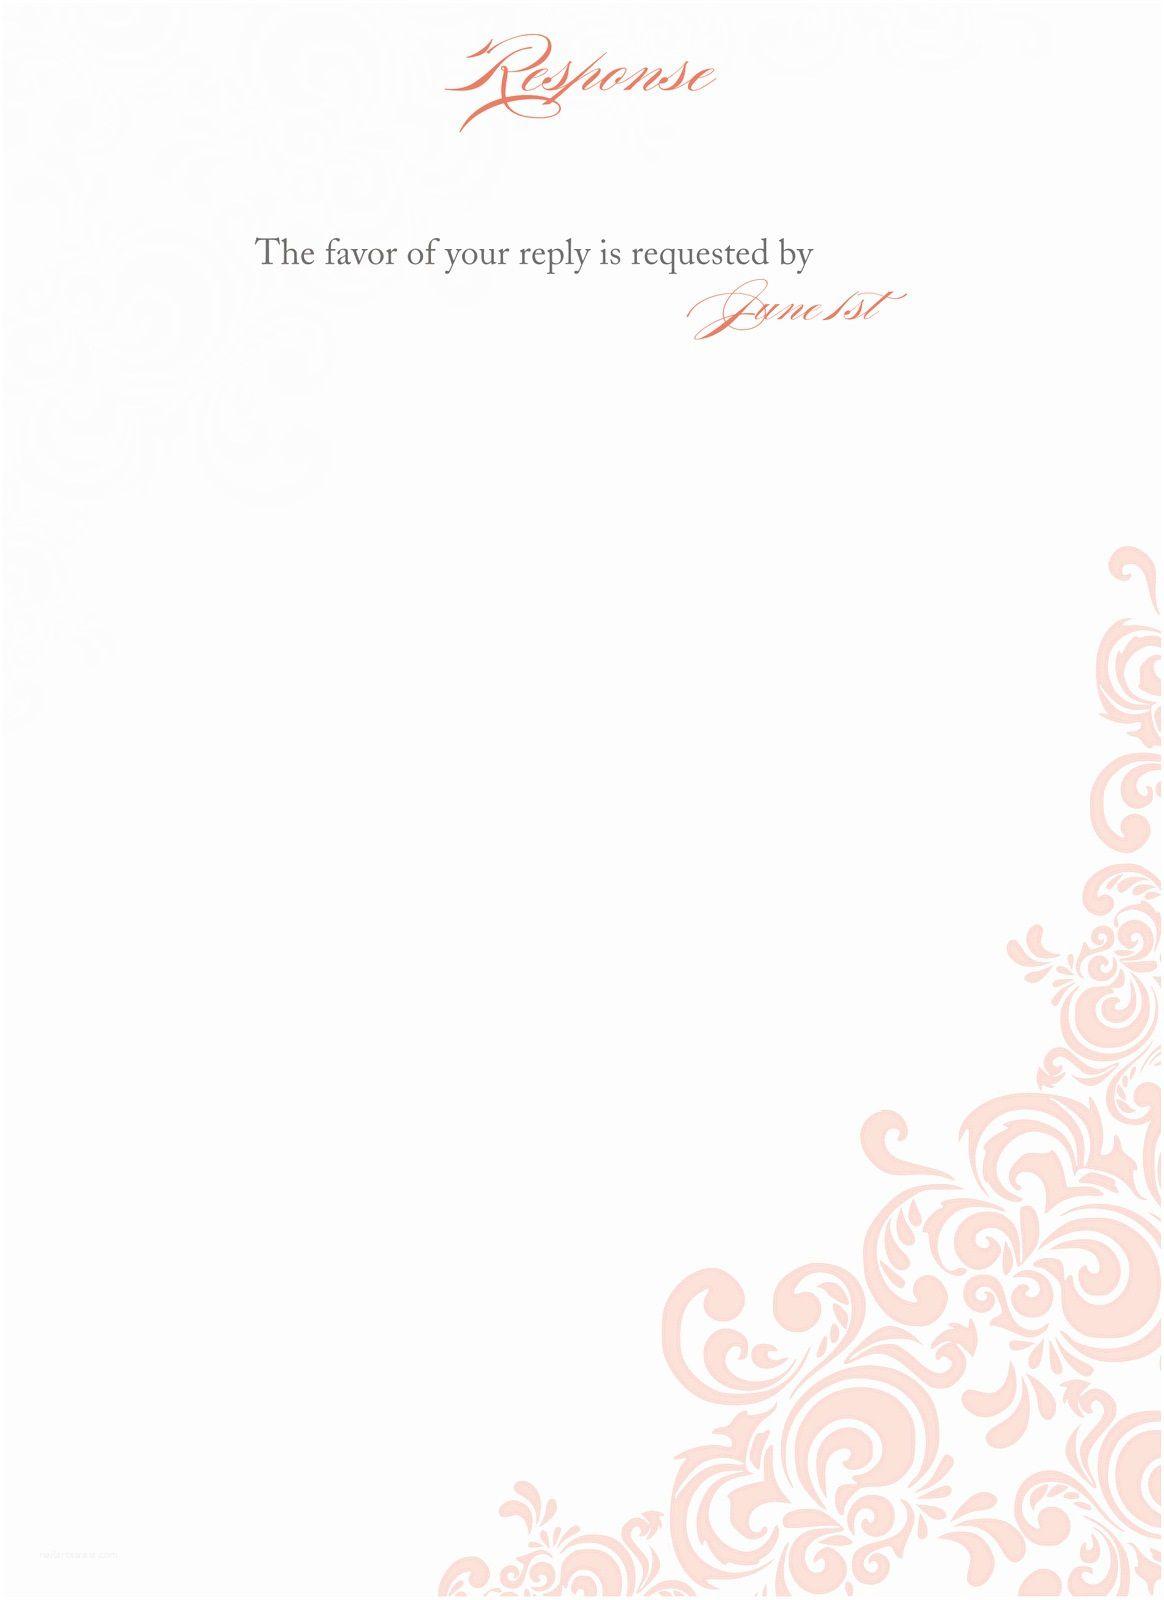 006 Wonderful Blank Wedding Invitation Template Idea  Templates Free Download Printable Royal BlueFull